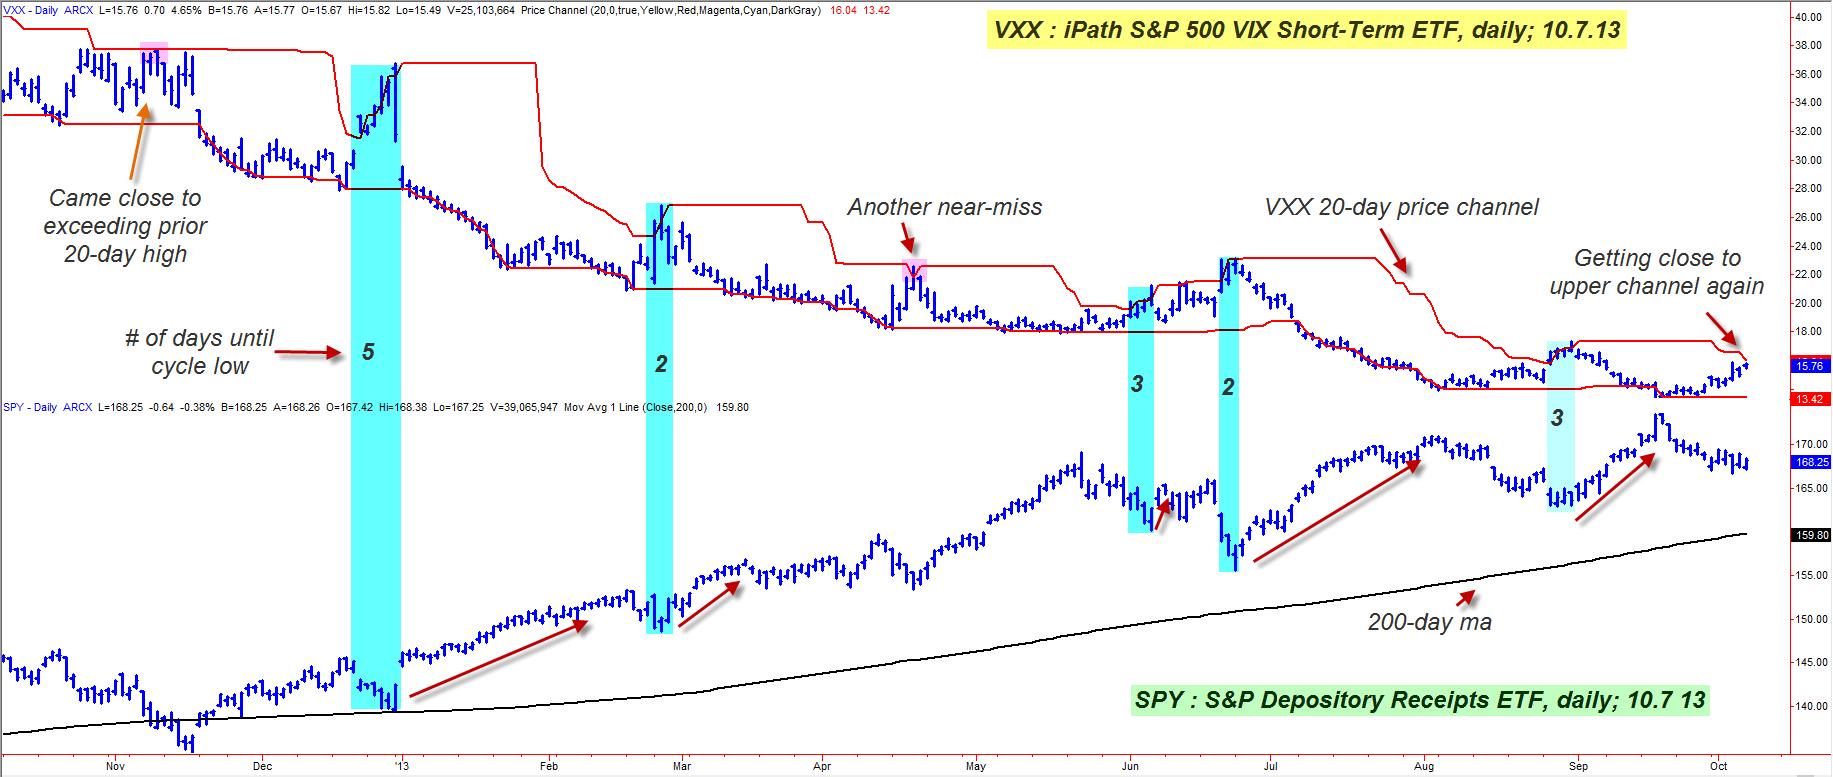 correlation analysis spy and vxx interesting inverse correlations